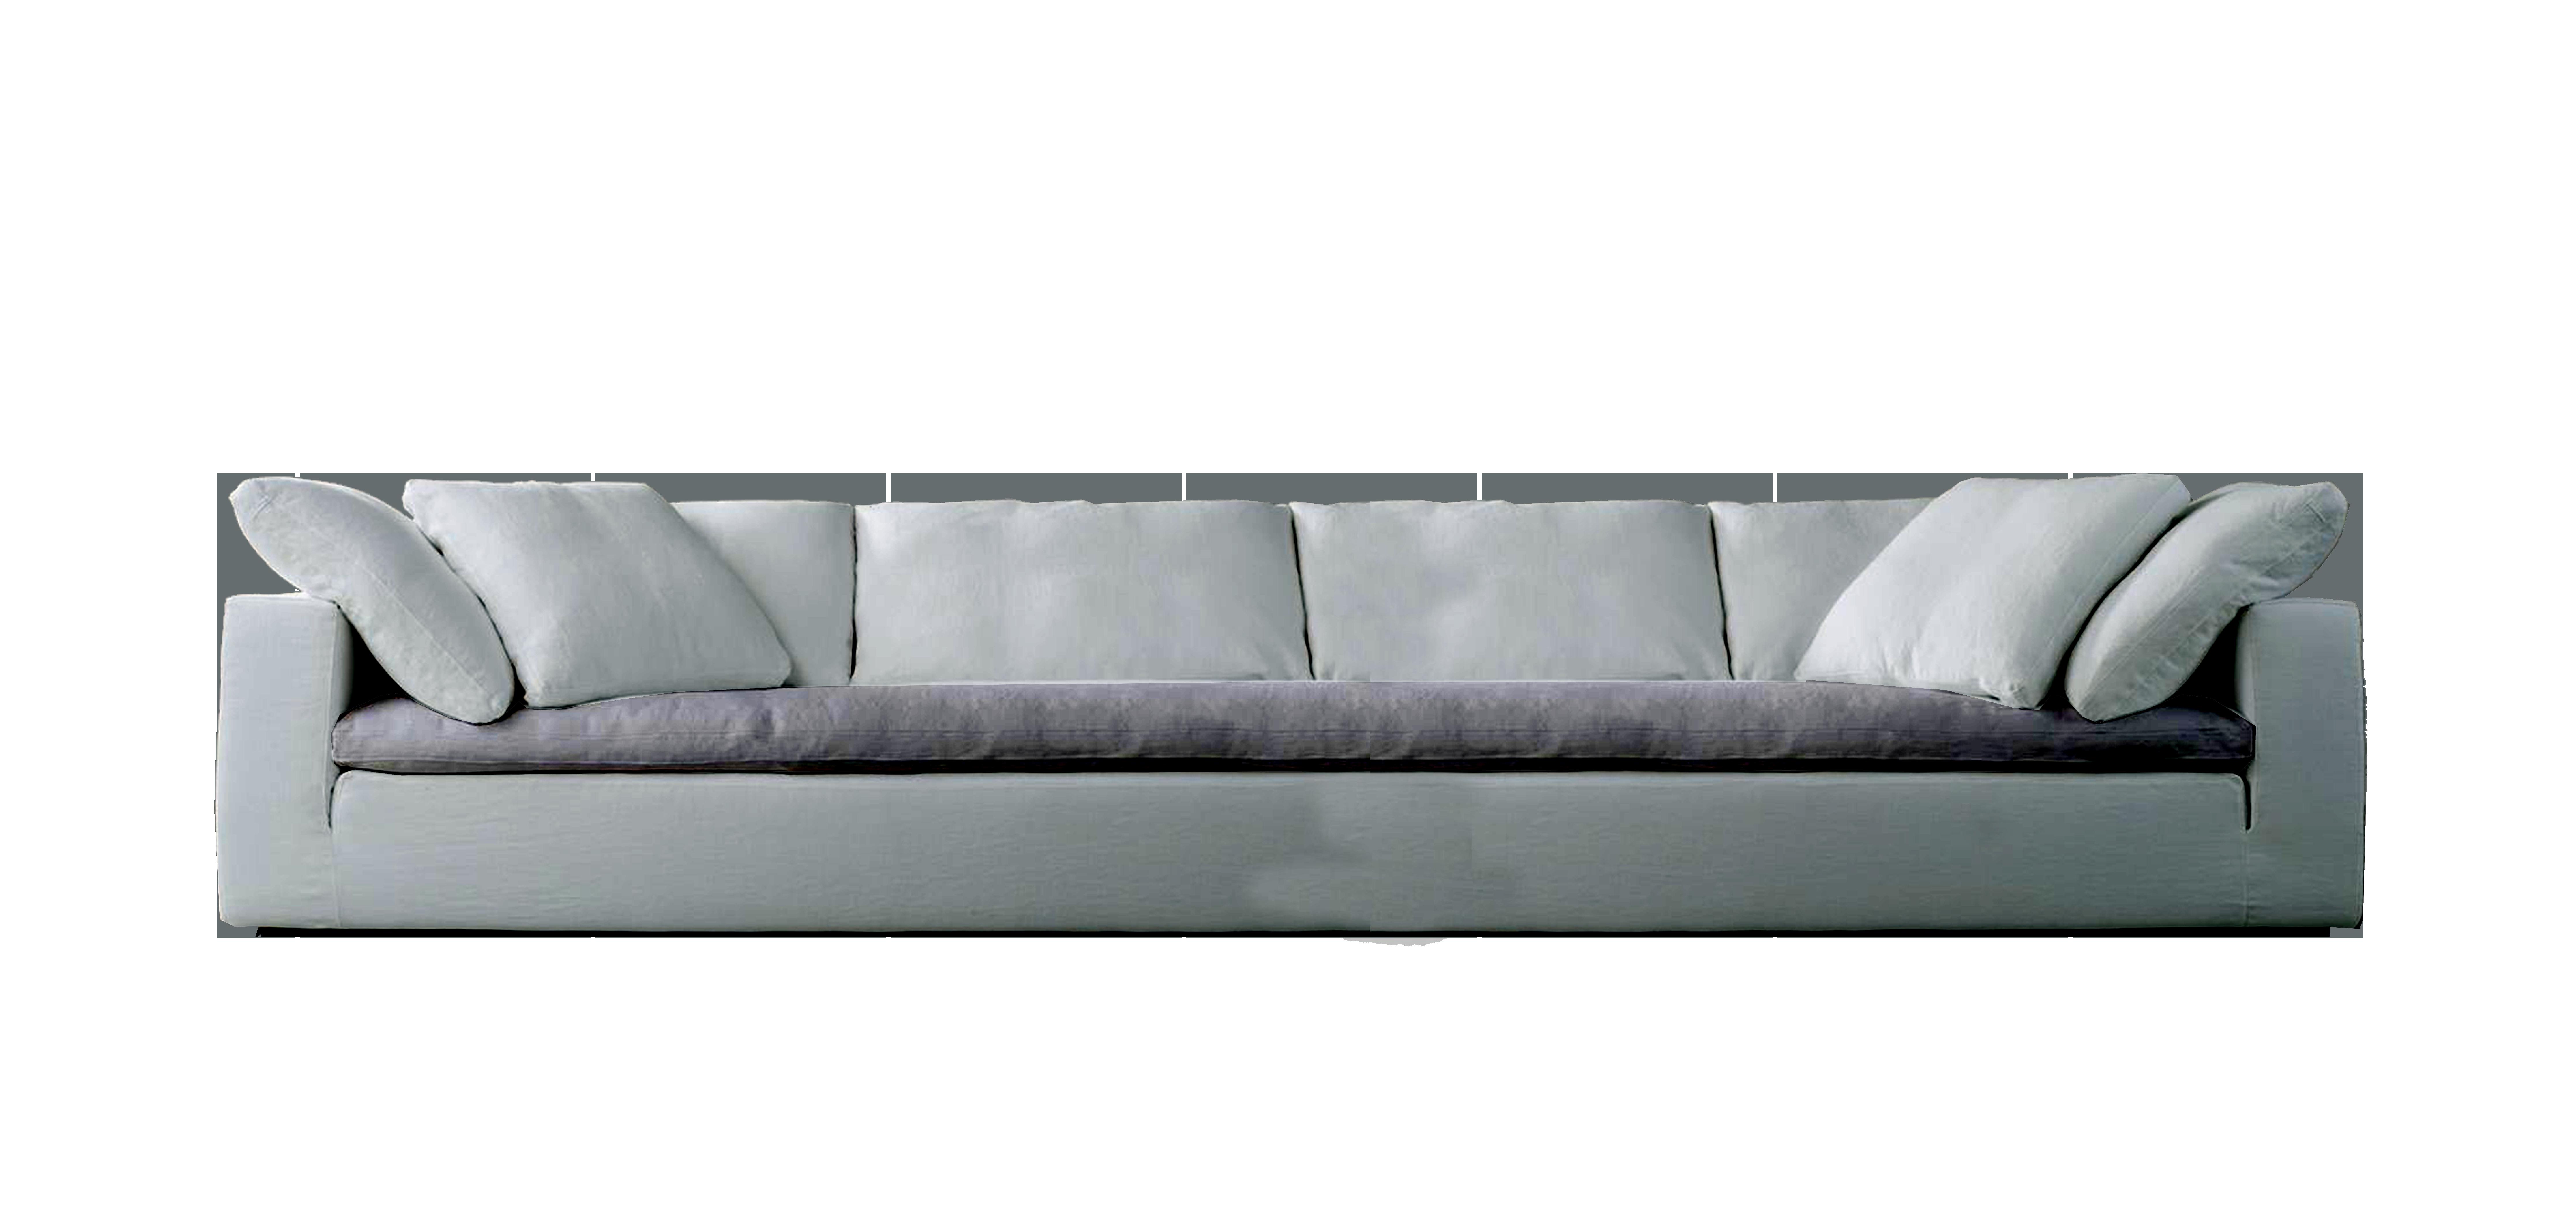 sofa 4 plazas de diseño moderno madrid